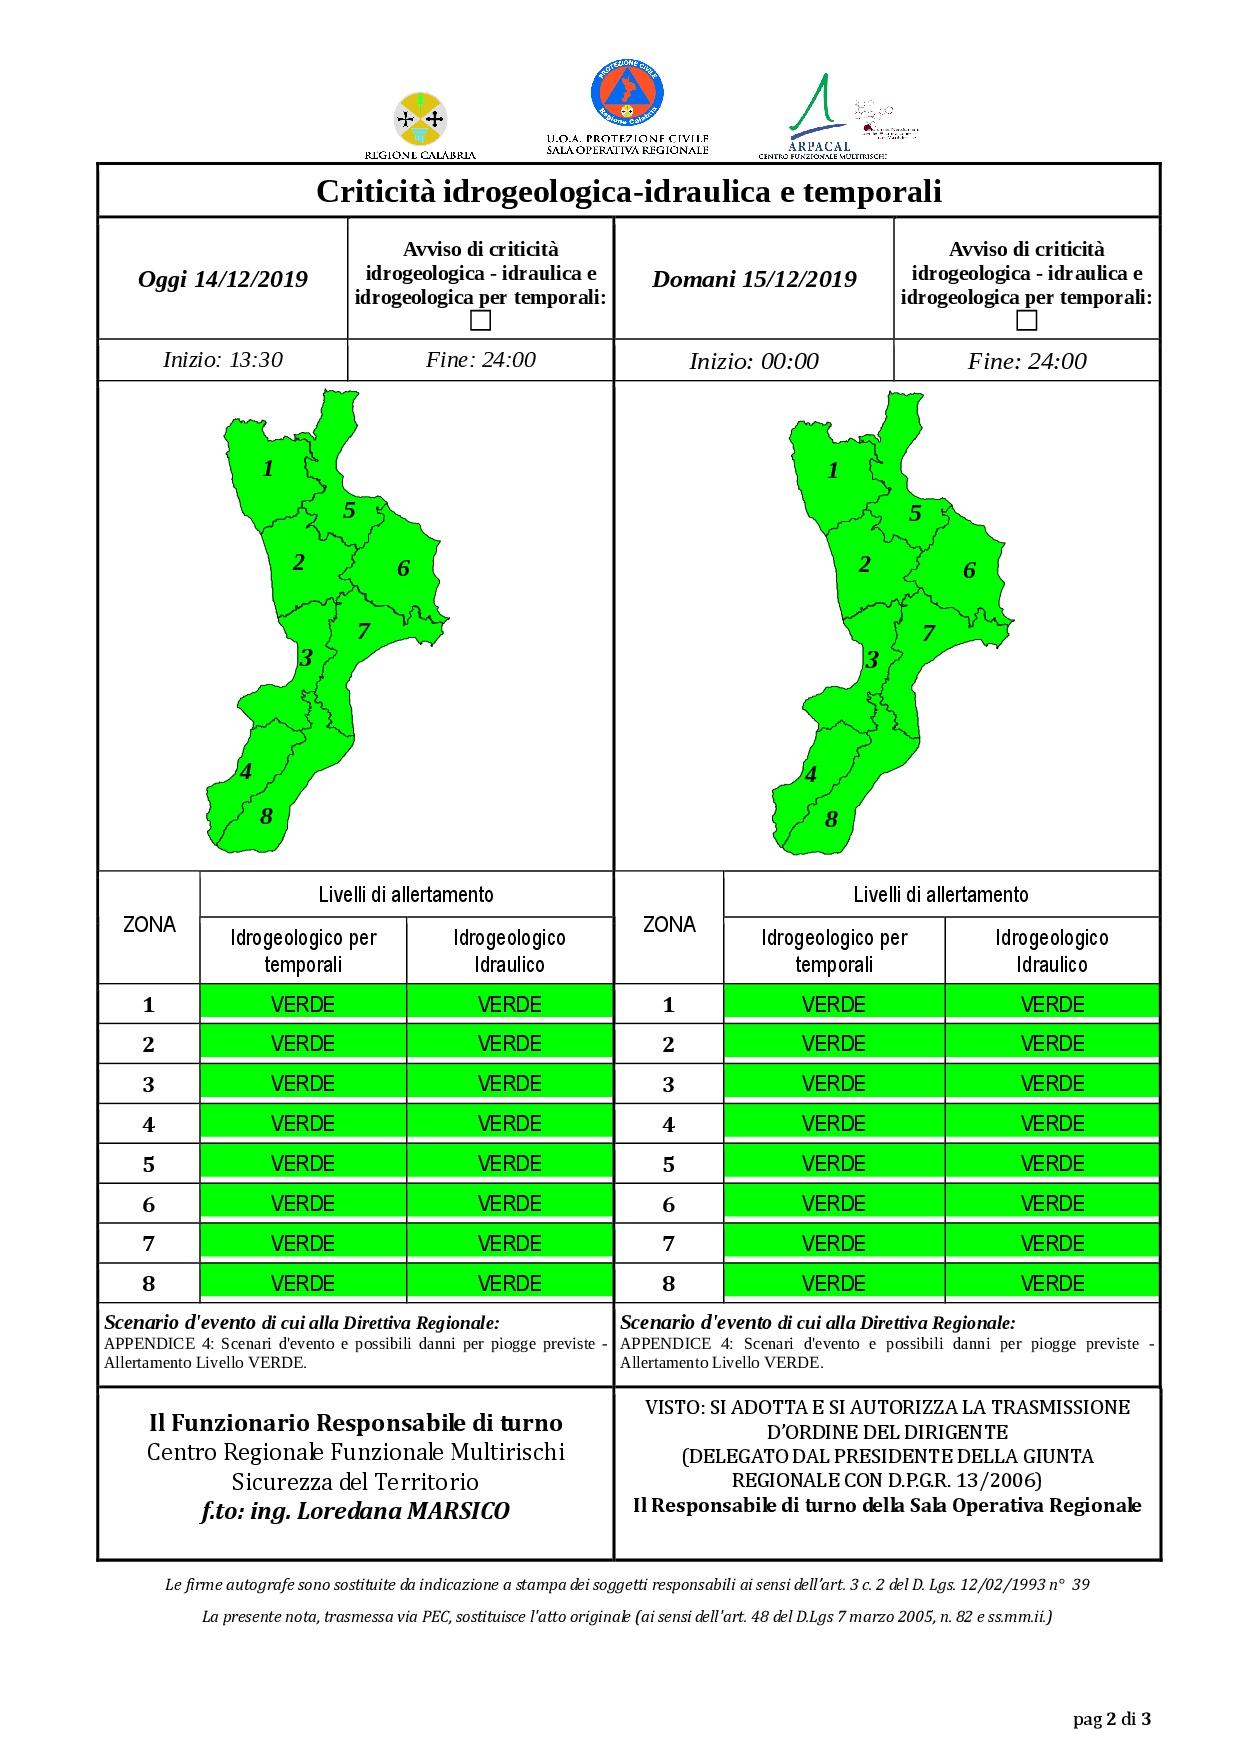 Criticità idrogeologica-idraulica e temporali in Calabria 14-12-2019